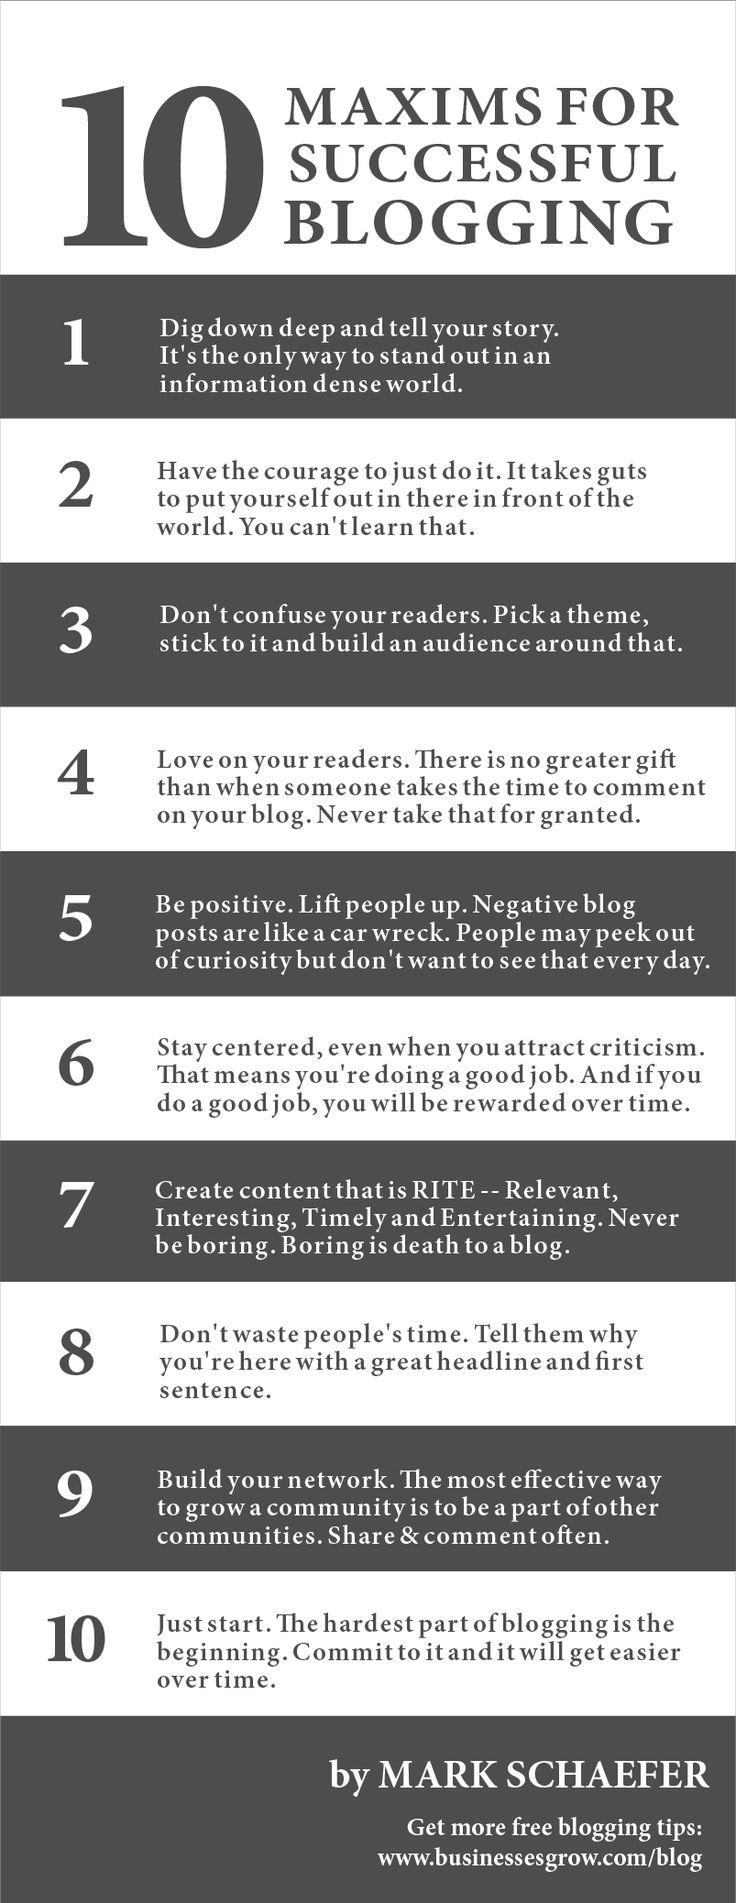 10 Maxims for successful blogging